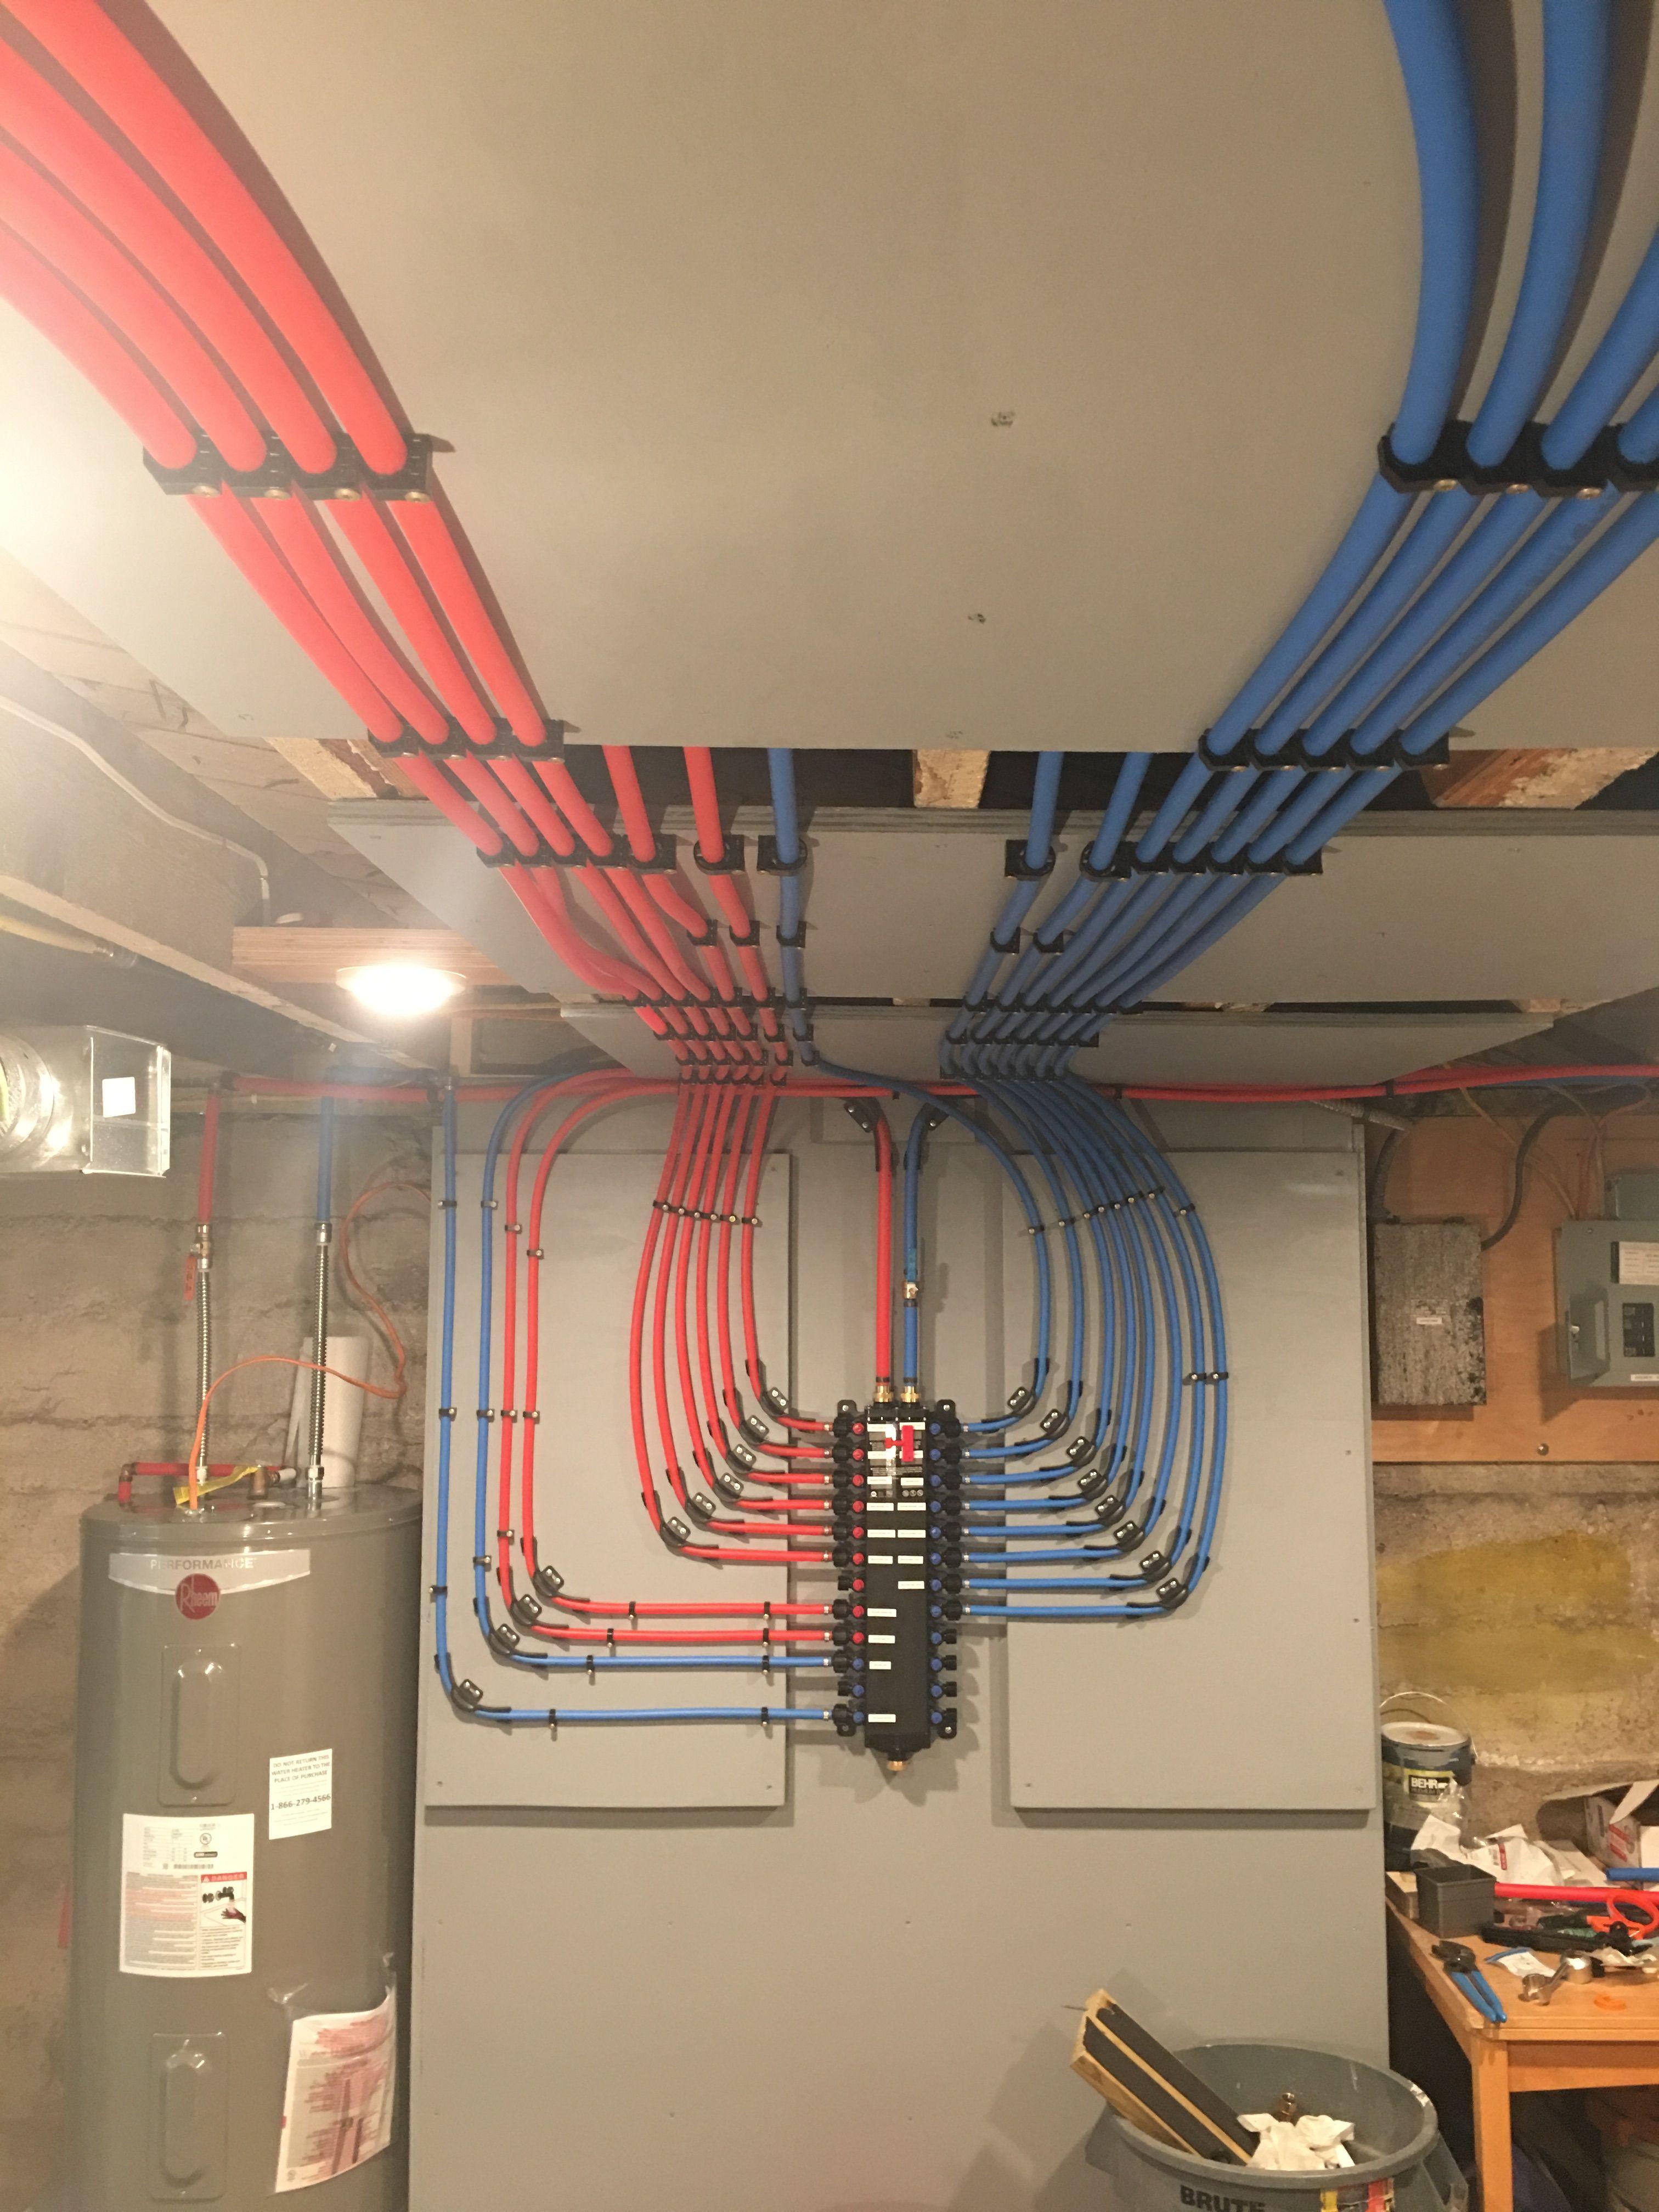 Pex With Manabloc Manifold In 2020 Pex Plumbing Heating And Plumbing Diy Plumbing